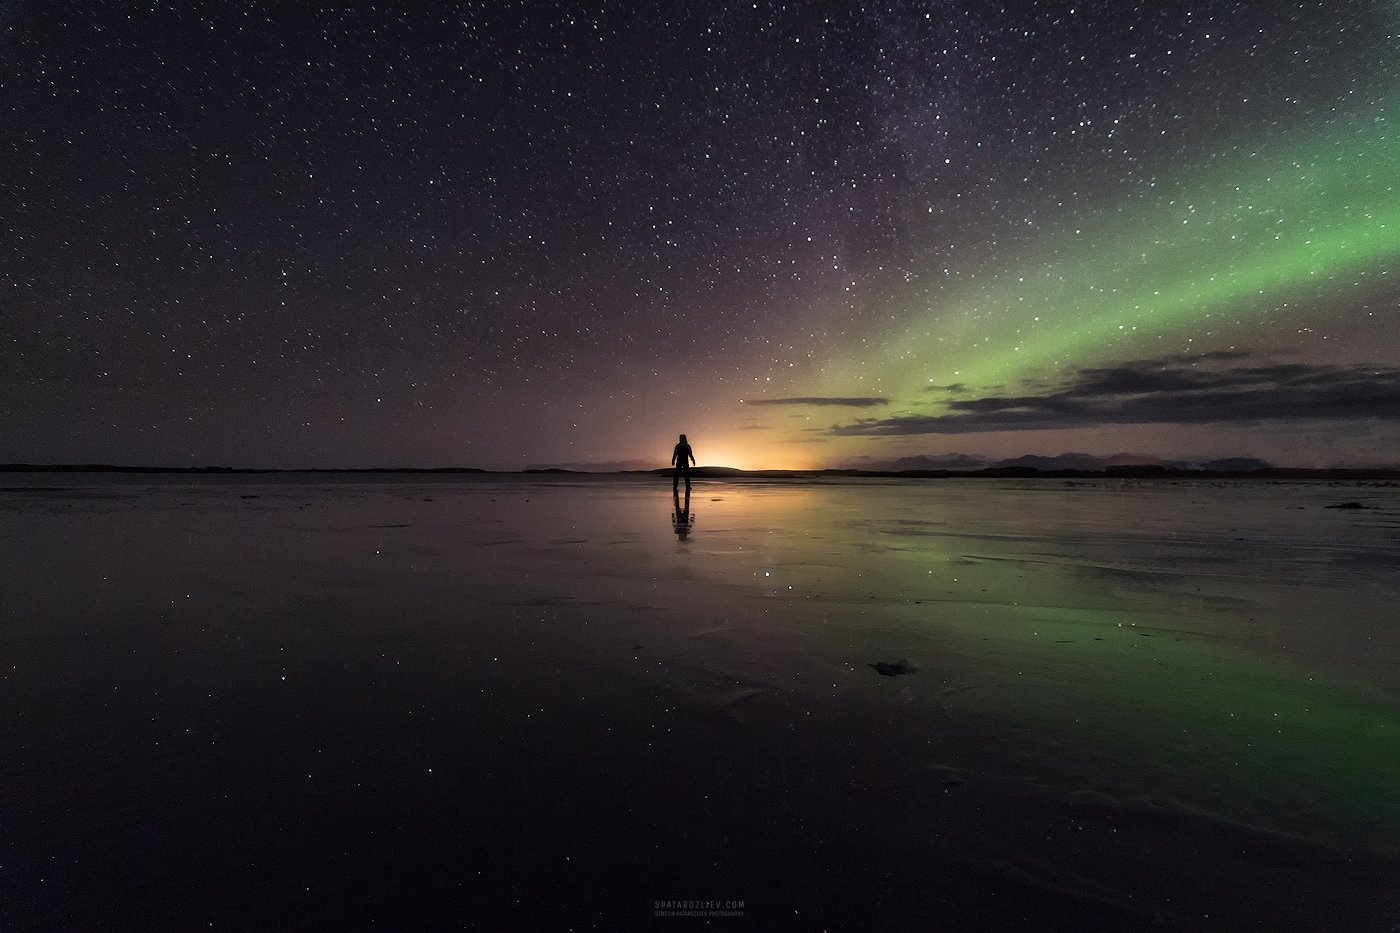 iceland, landscape, travel, person, silhouette, northern lights, aurora, night, stars, reflection, Симеон Патарозлиев